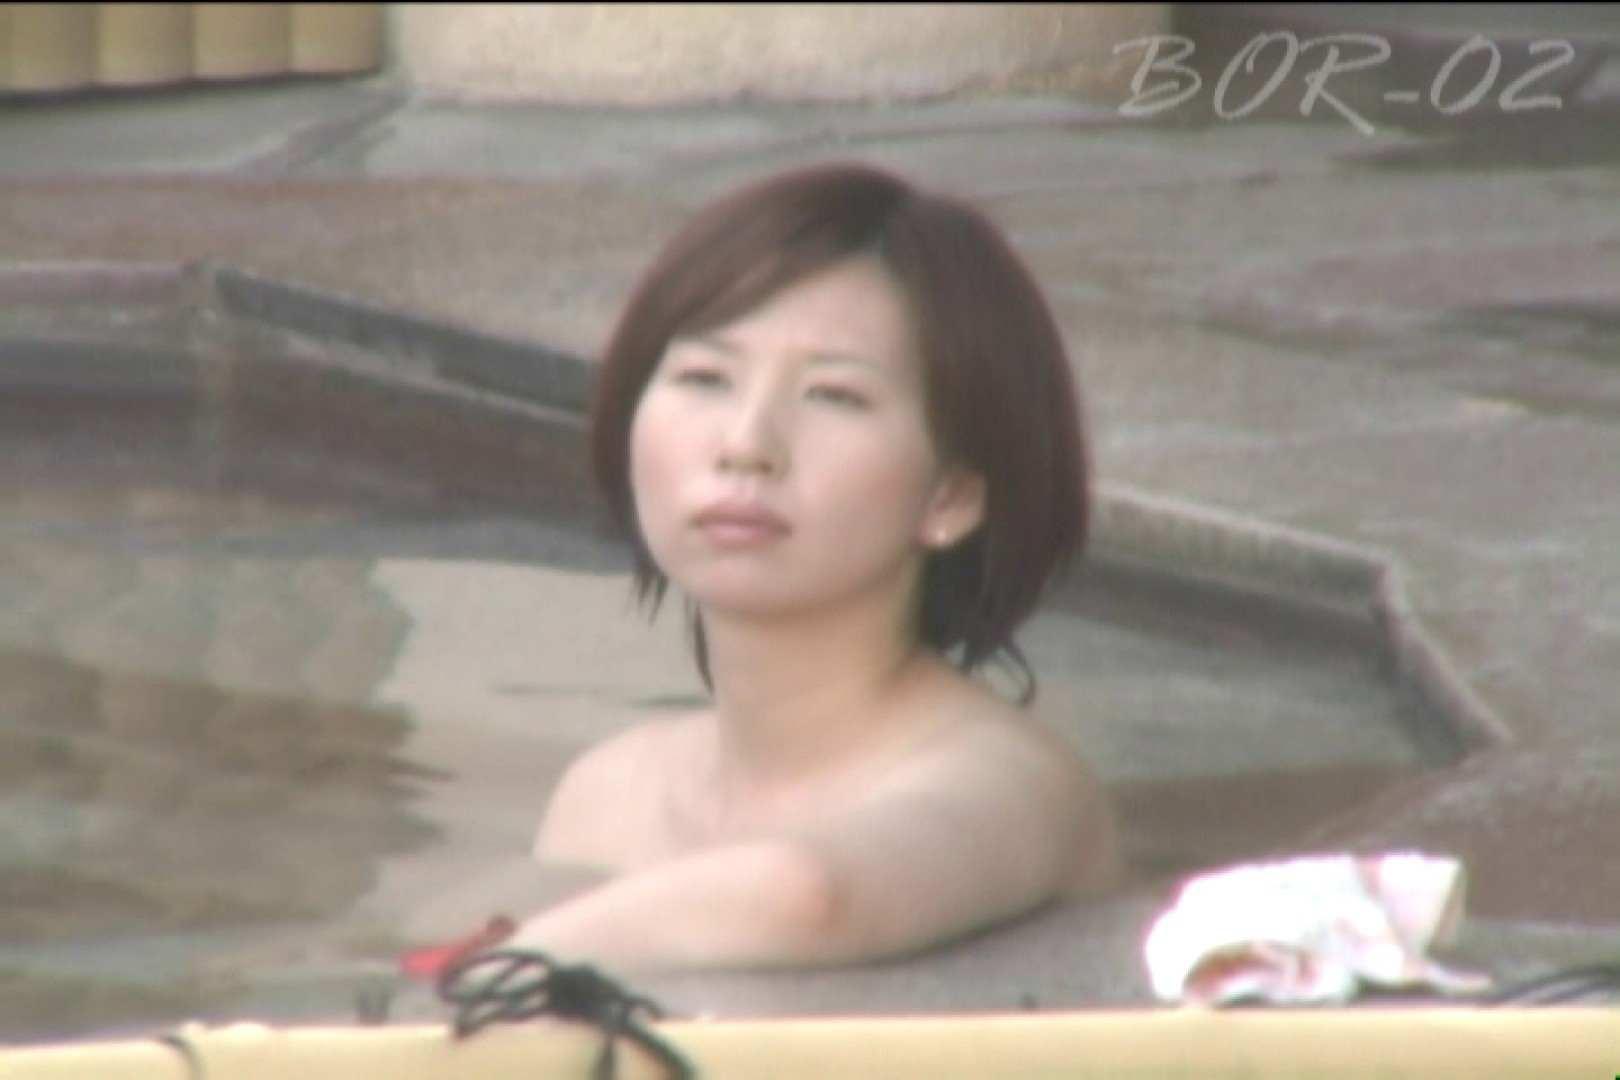 Aquaな露天風呂Vol.476 盗撮師作品 オマンコ無修正動画無料 85pic 5